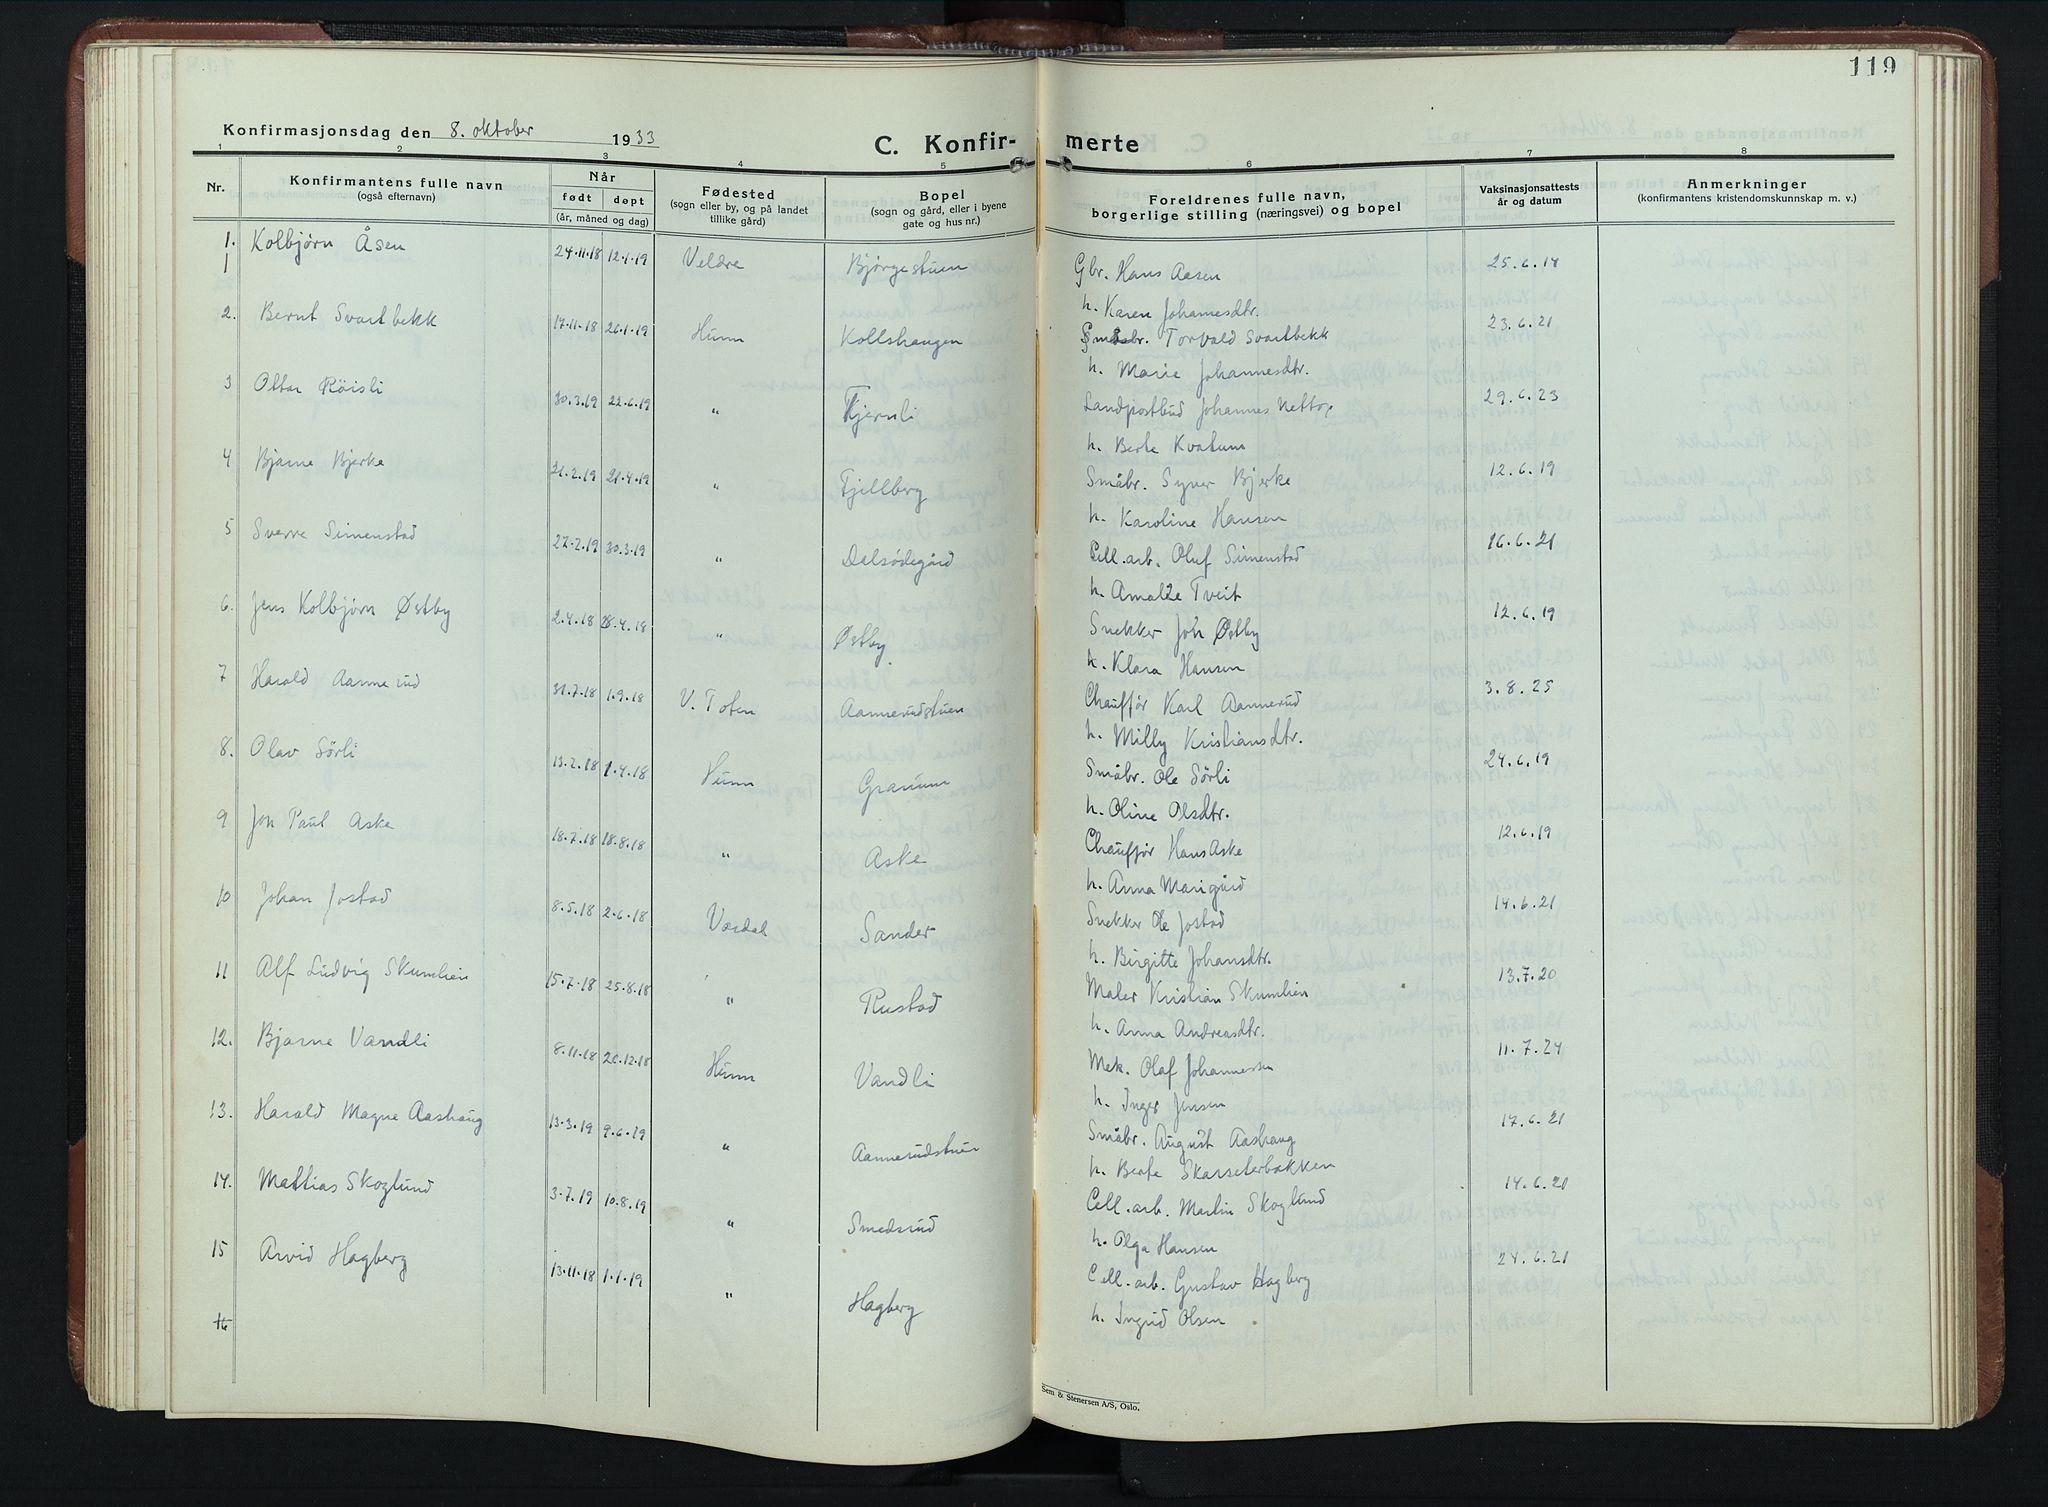 SAH, Vardal prestekontor, H/Ha/Hab/L0023: Klokkerbok nr. 23, 1929-1941, s. 119